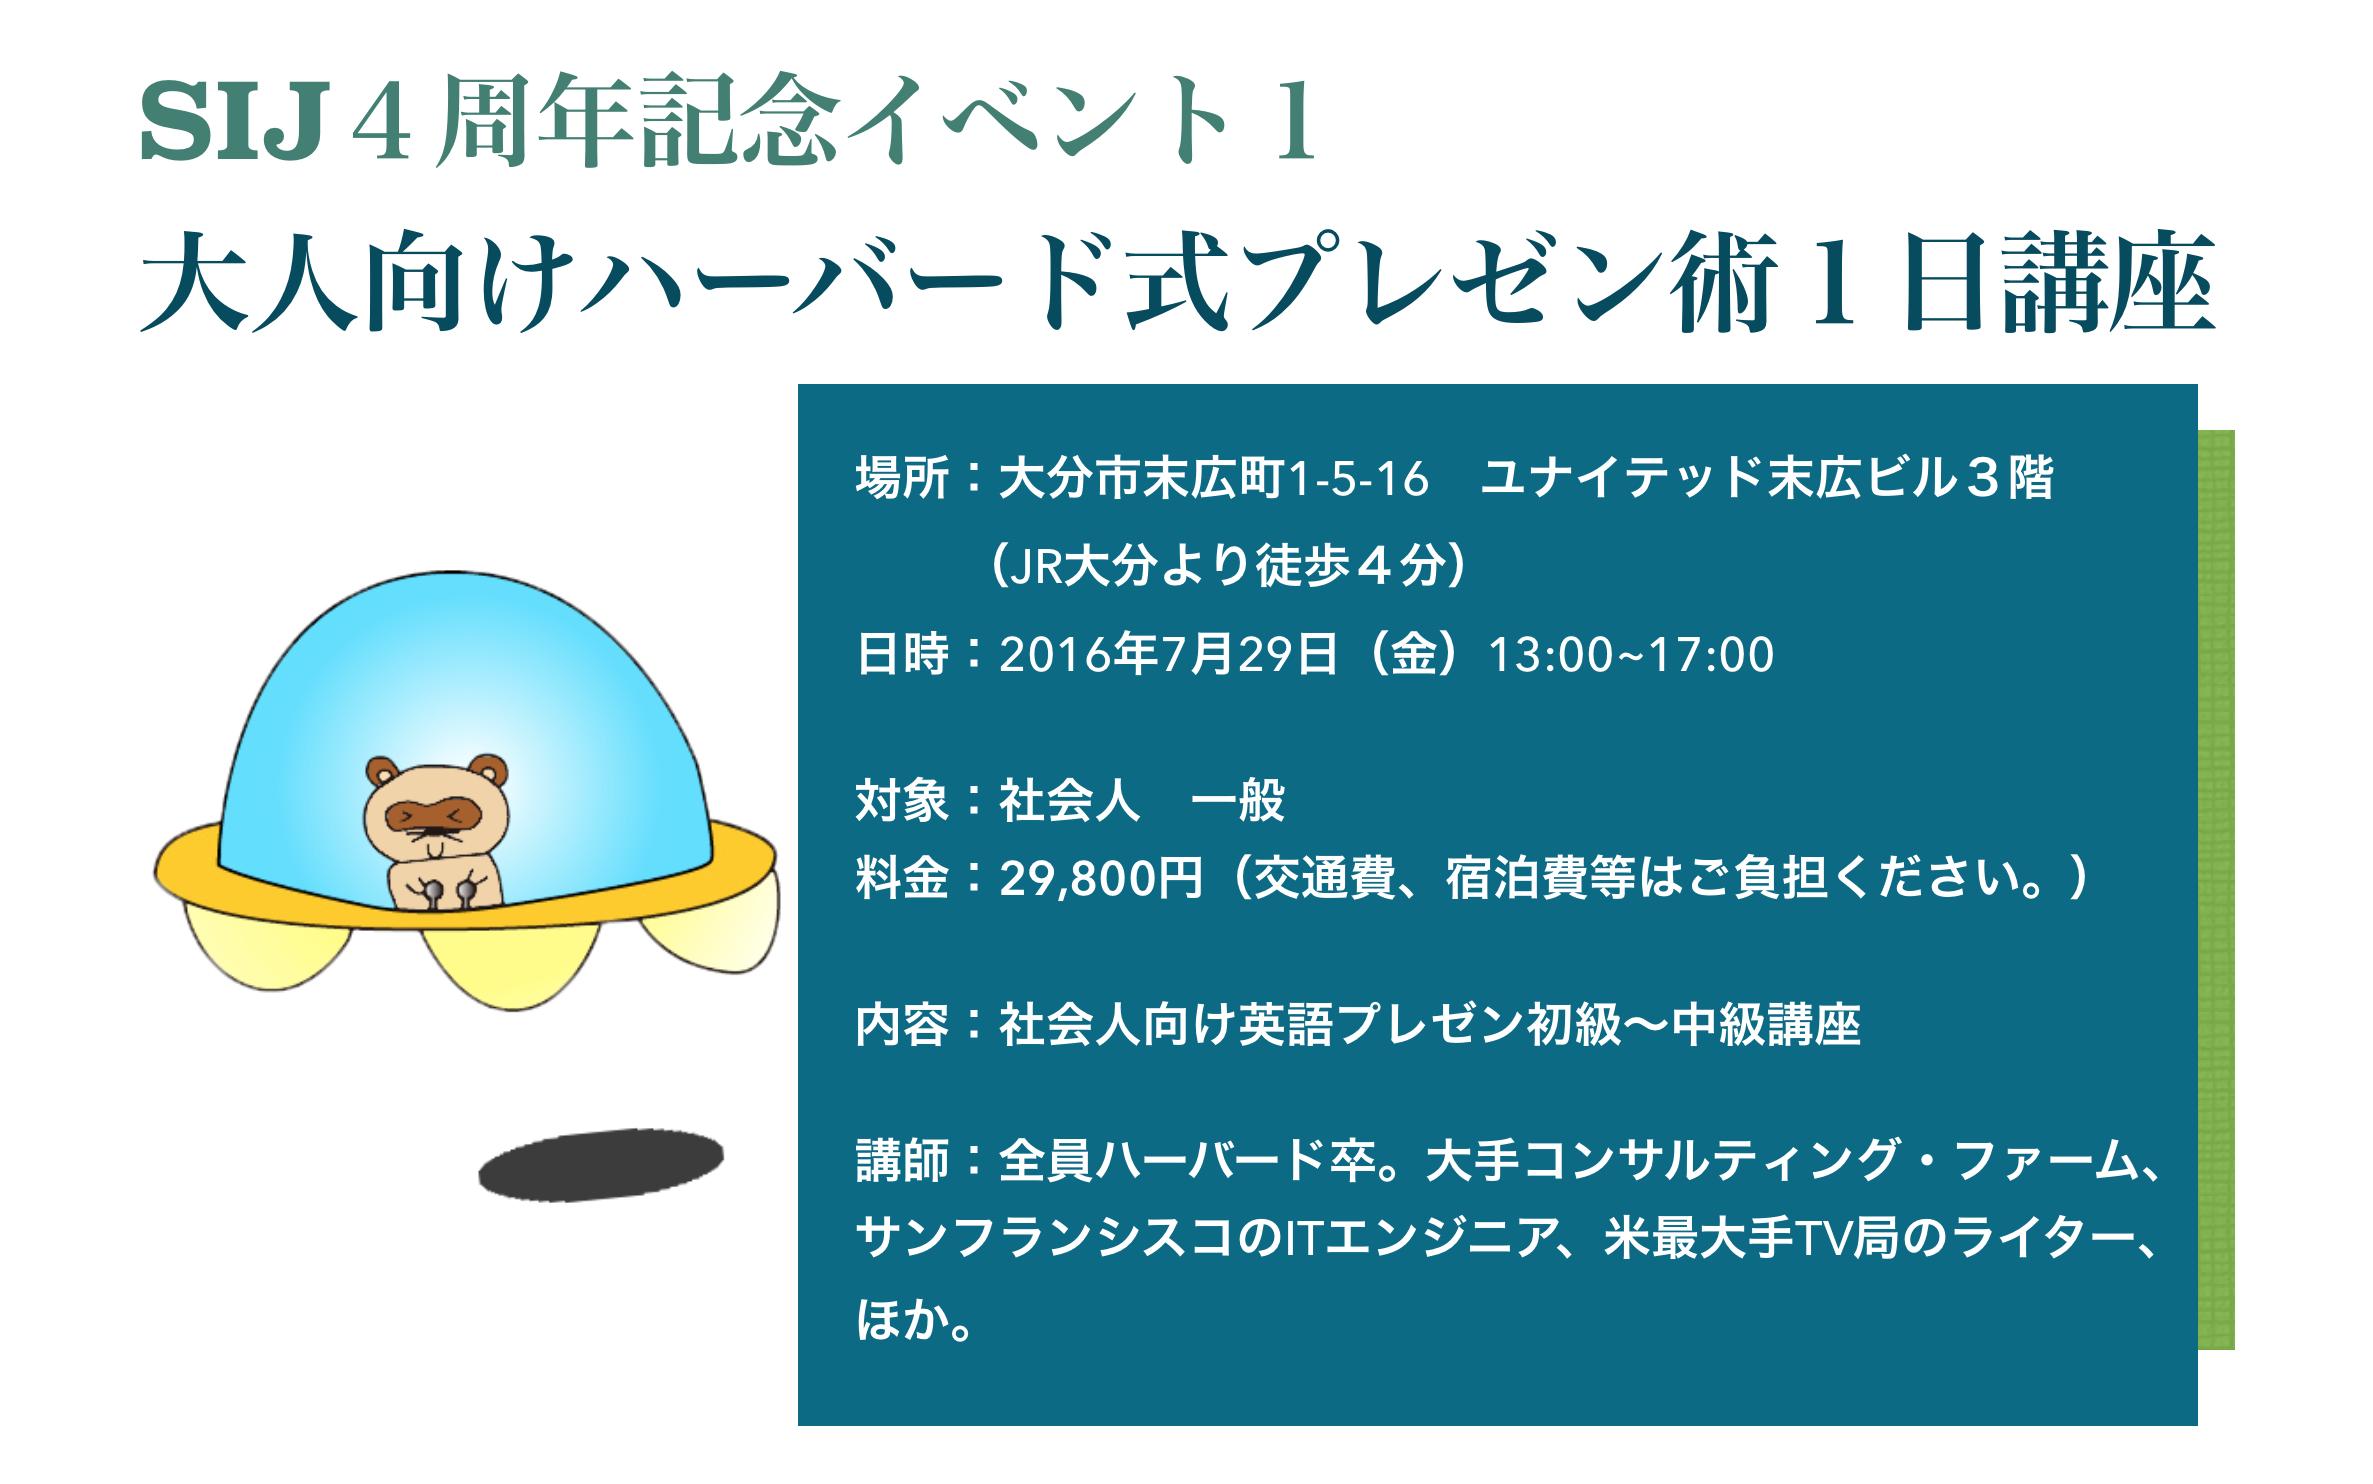 Semi info